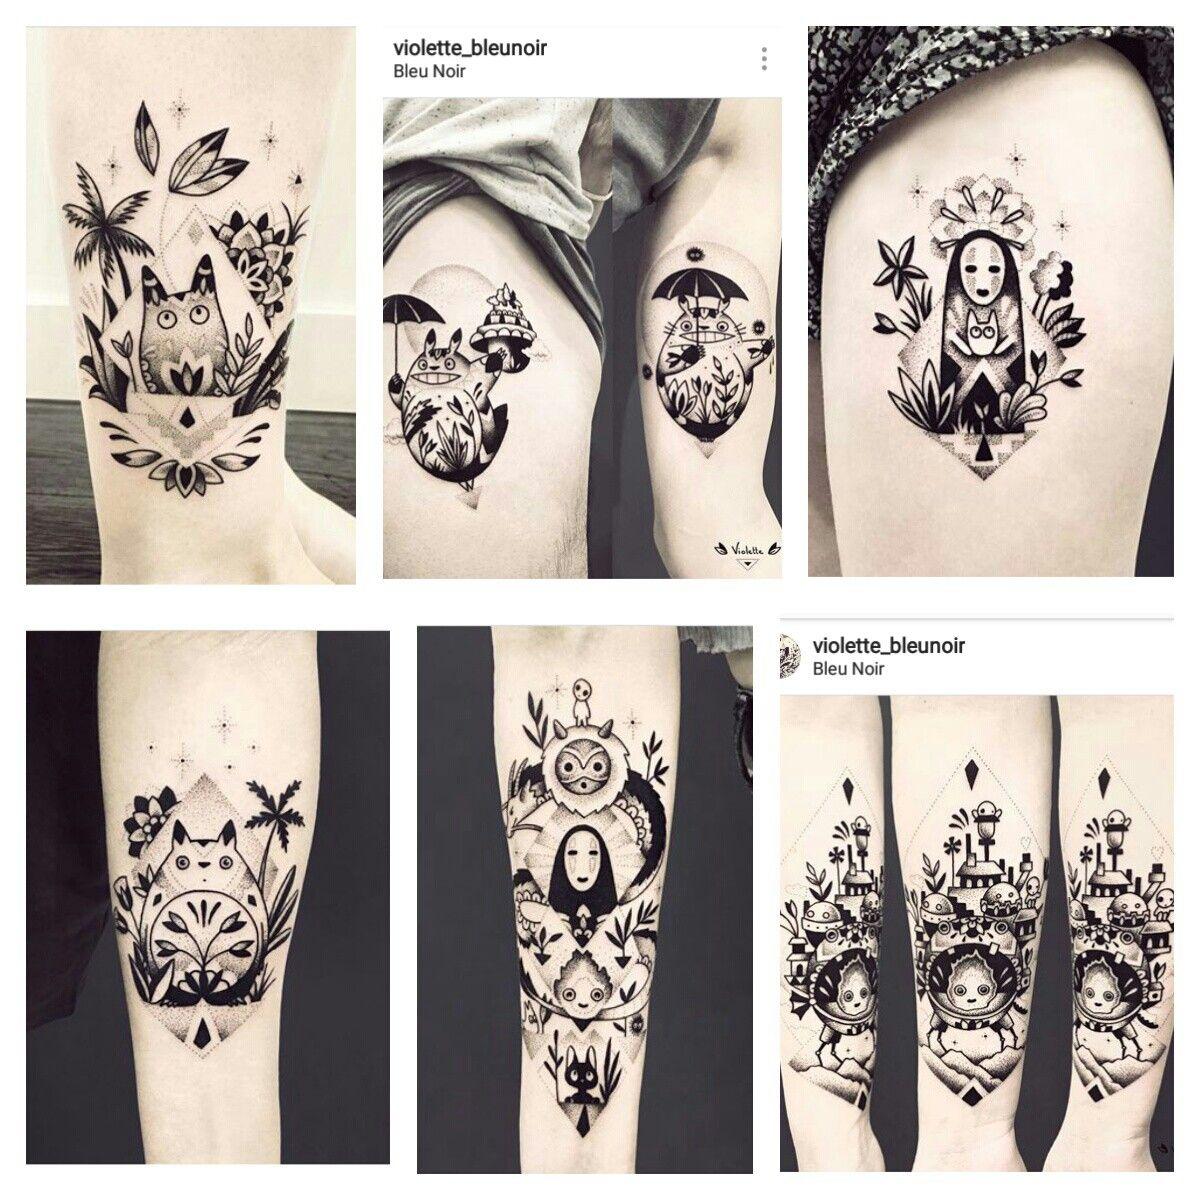 studio ghibli tattoos by violette bleunoir on instagram tattoo inspiration pinterest. Black Bedroom Furniture Sets. Home Design Ideas